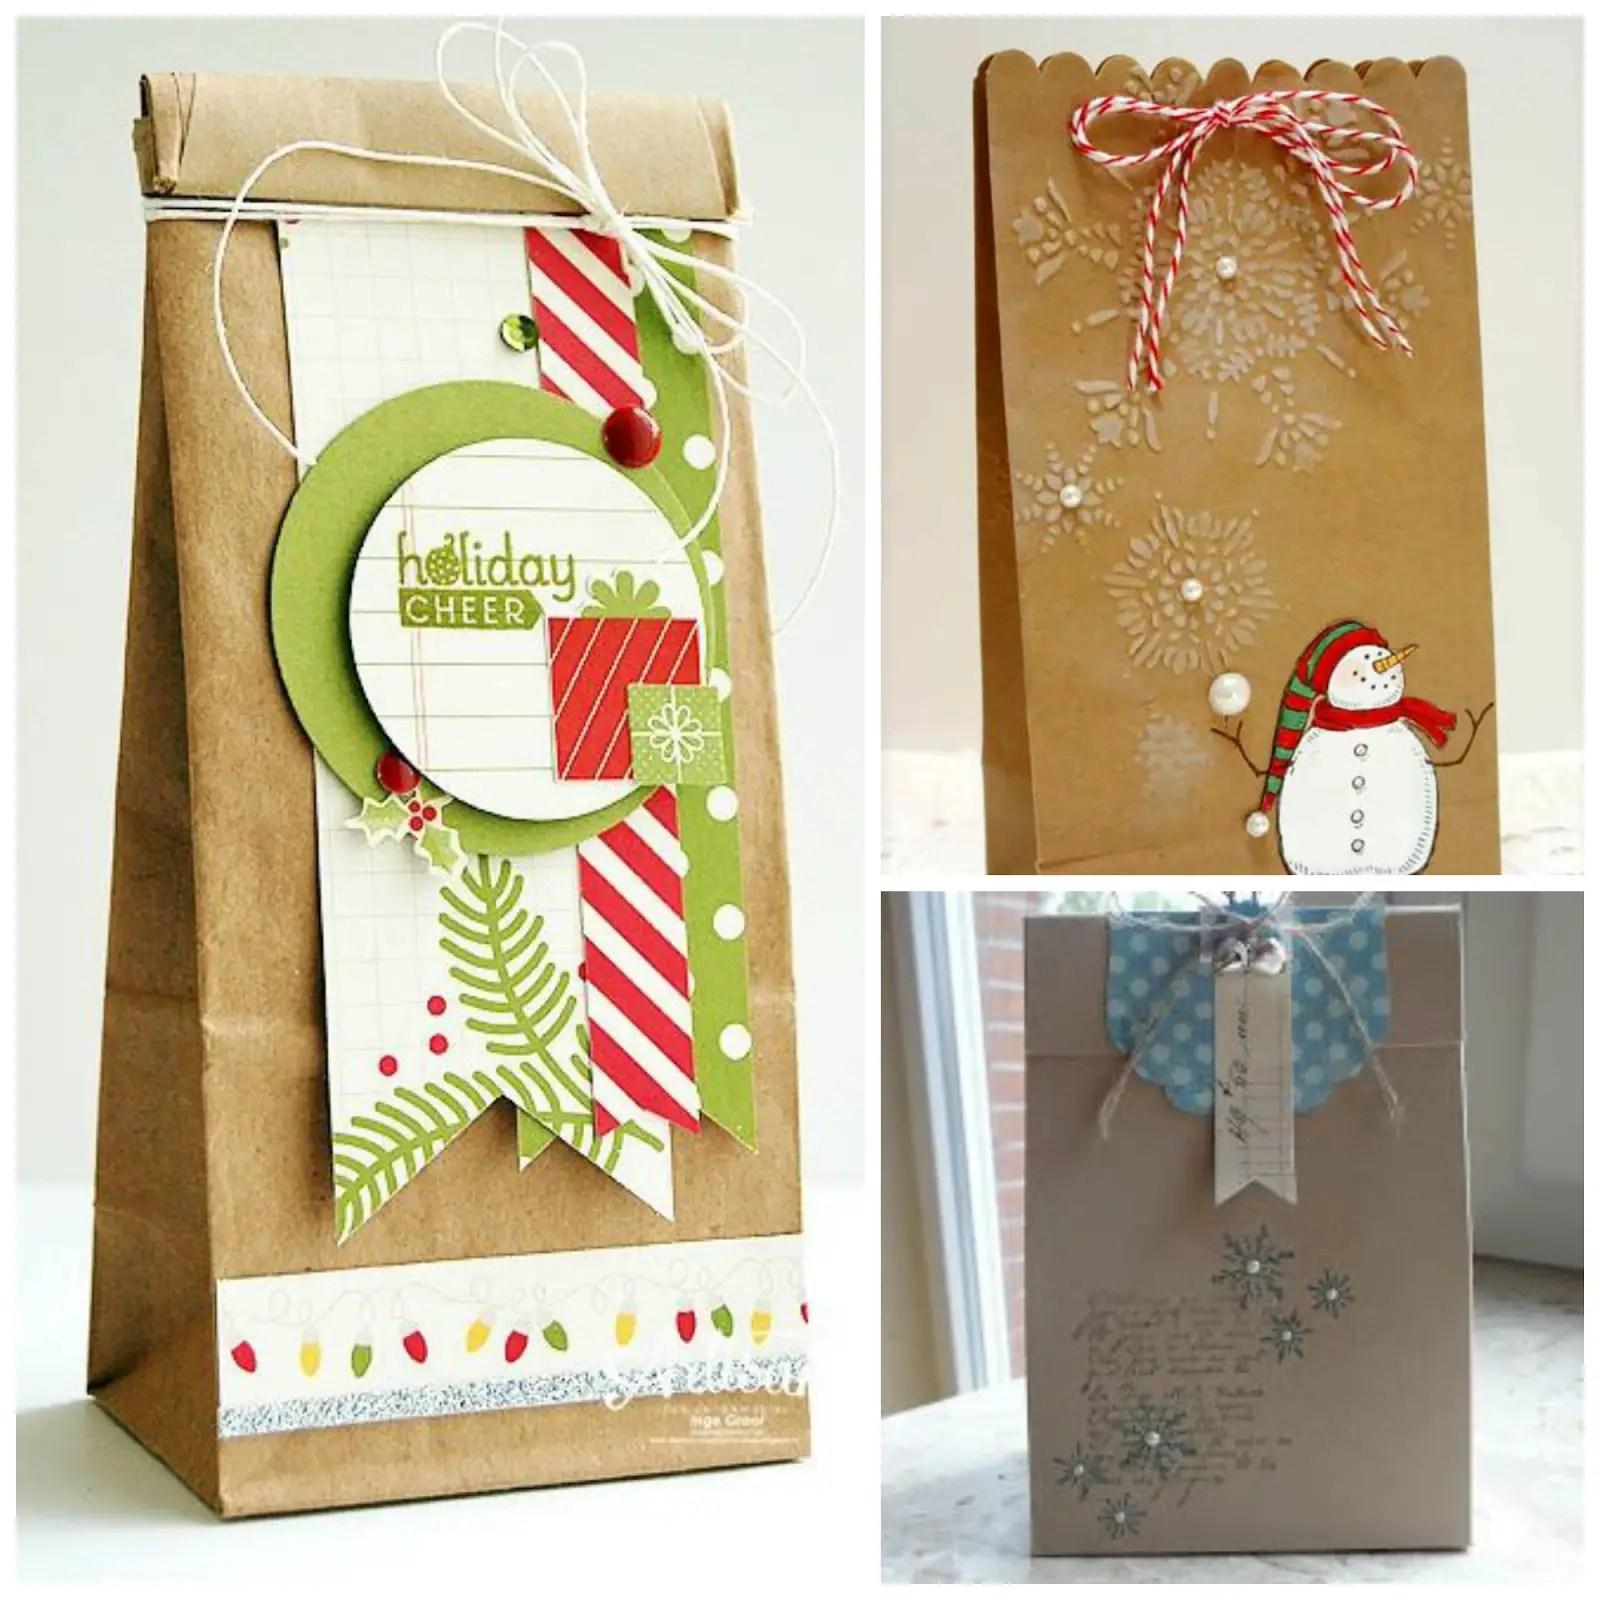 d60dc484c Bolsas para regalo navideño con bolsas de papel kraft - Dale Detalles